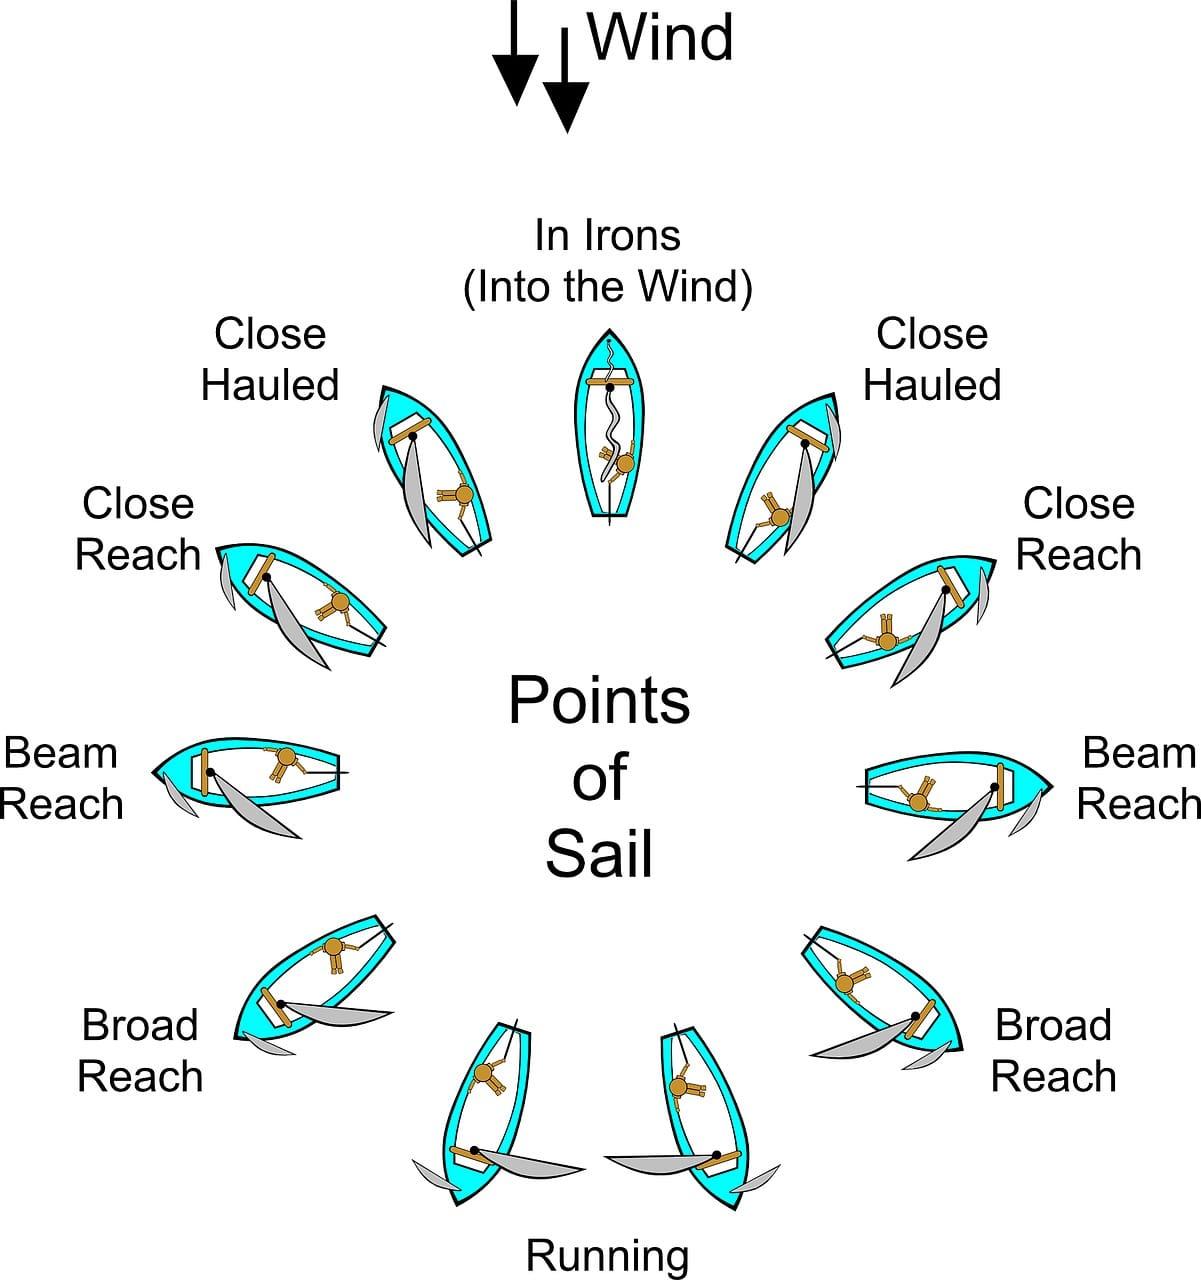 Points of Sail Diagram